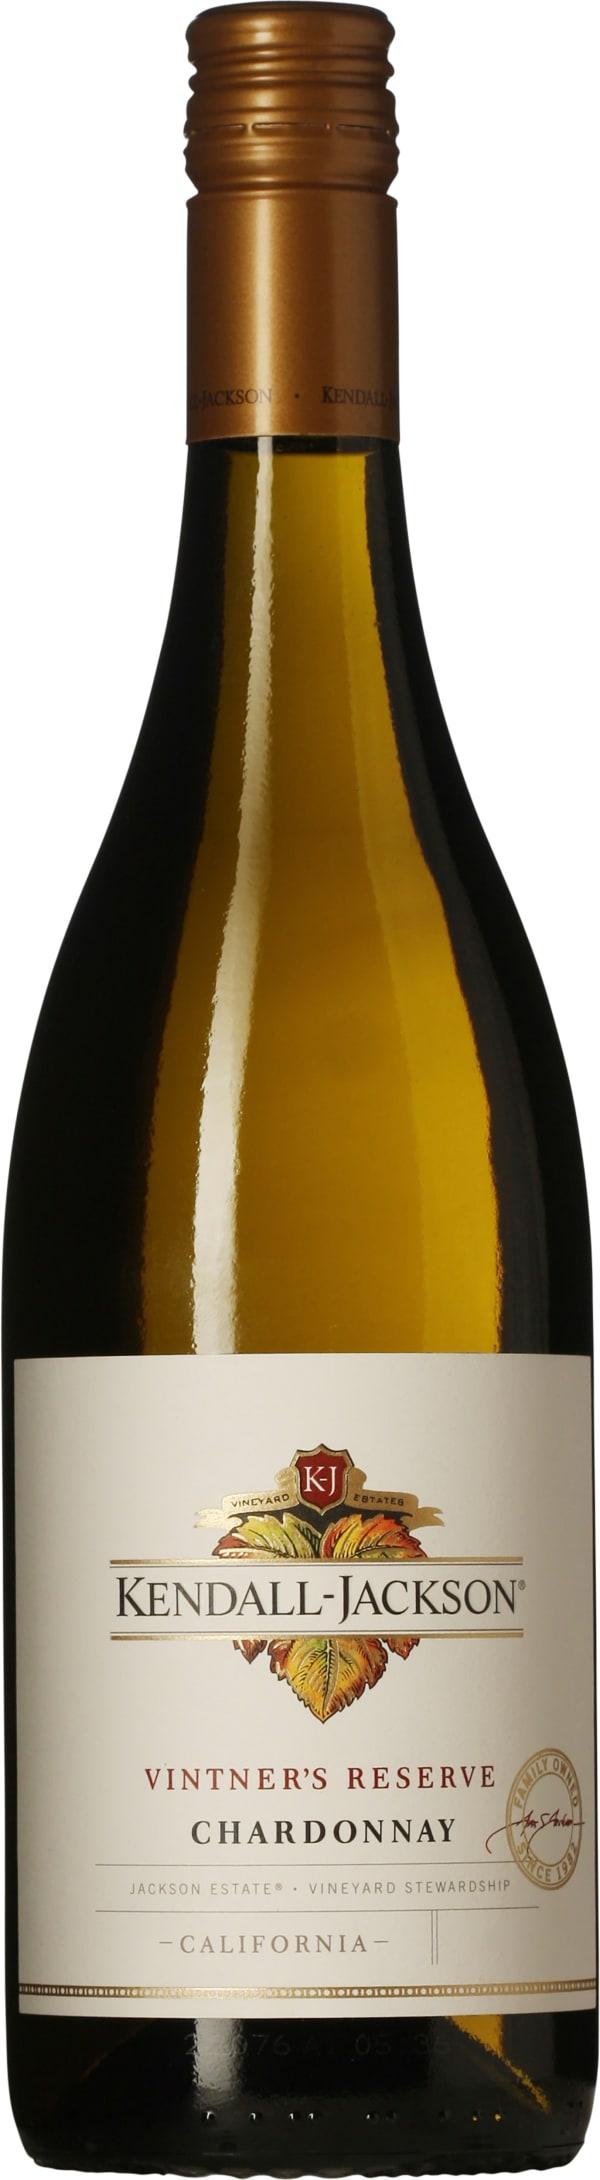 Kendall Jackson Vintner's Reserve Chardonnay 2019